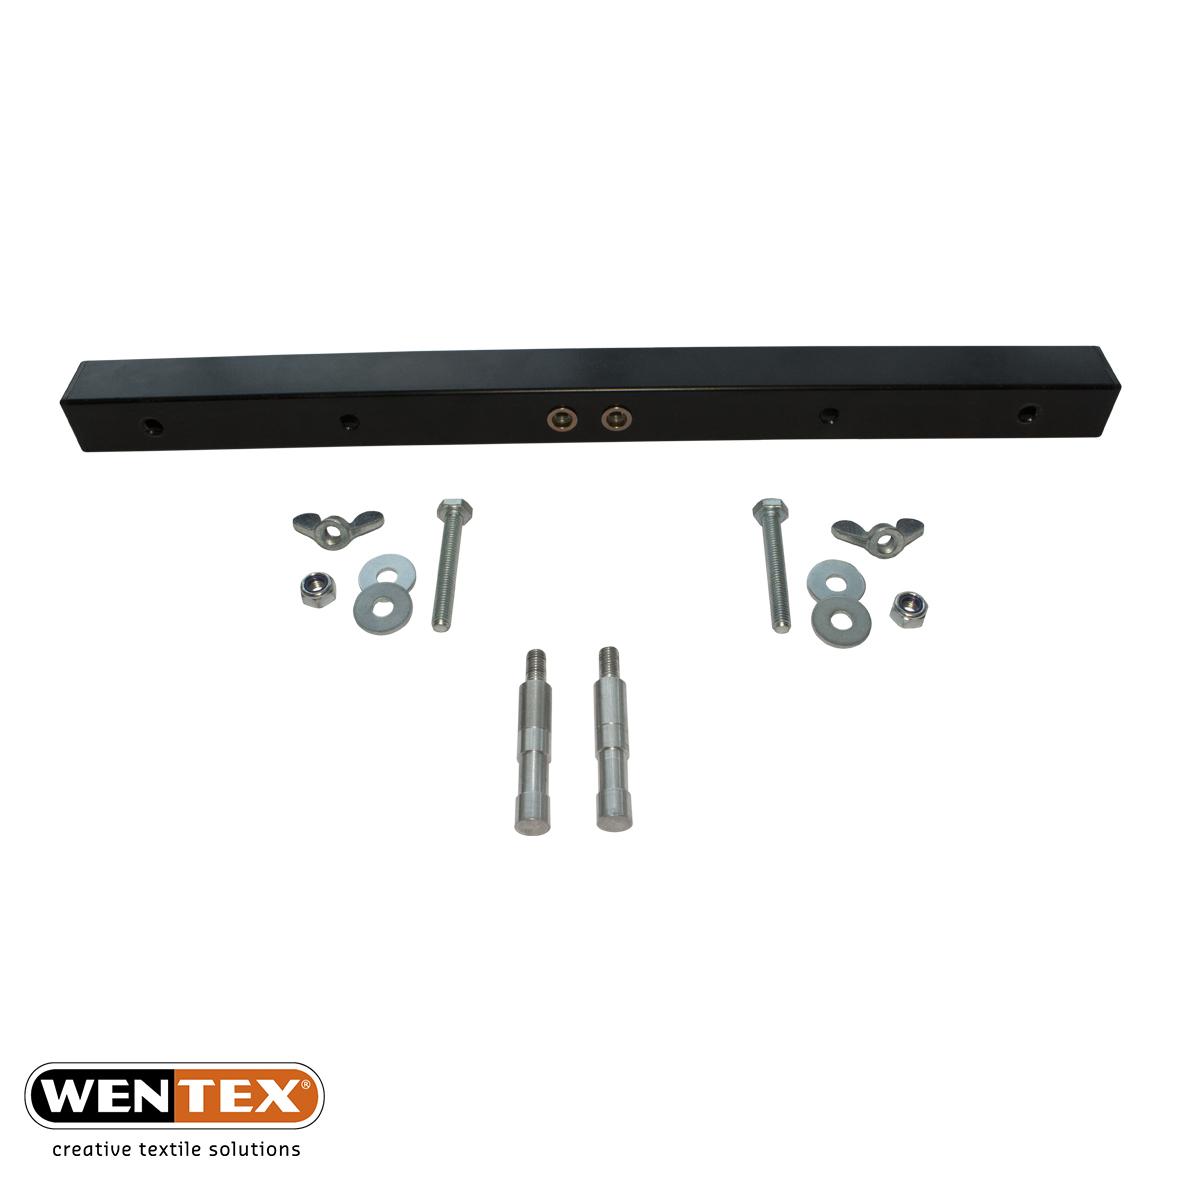 T-bar wiht screws and spigots